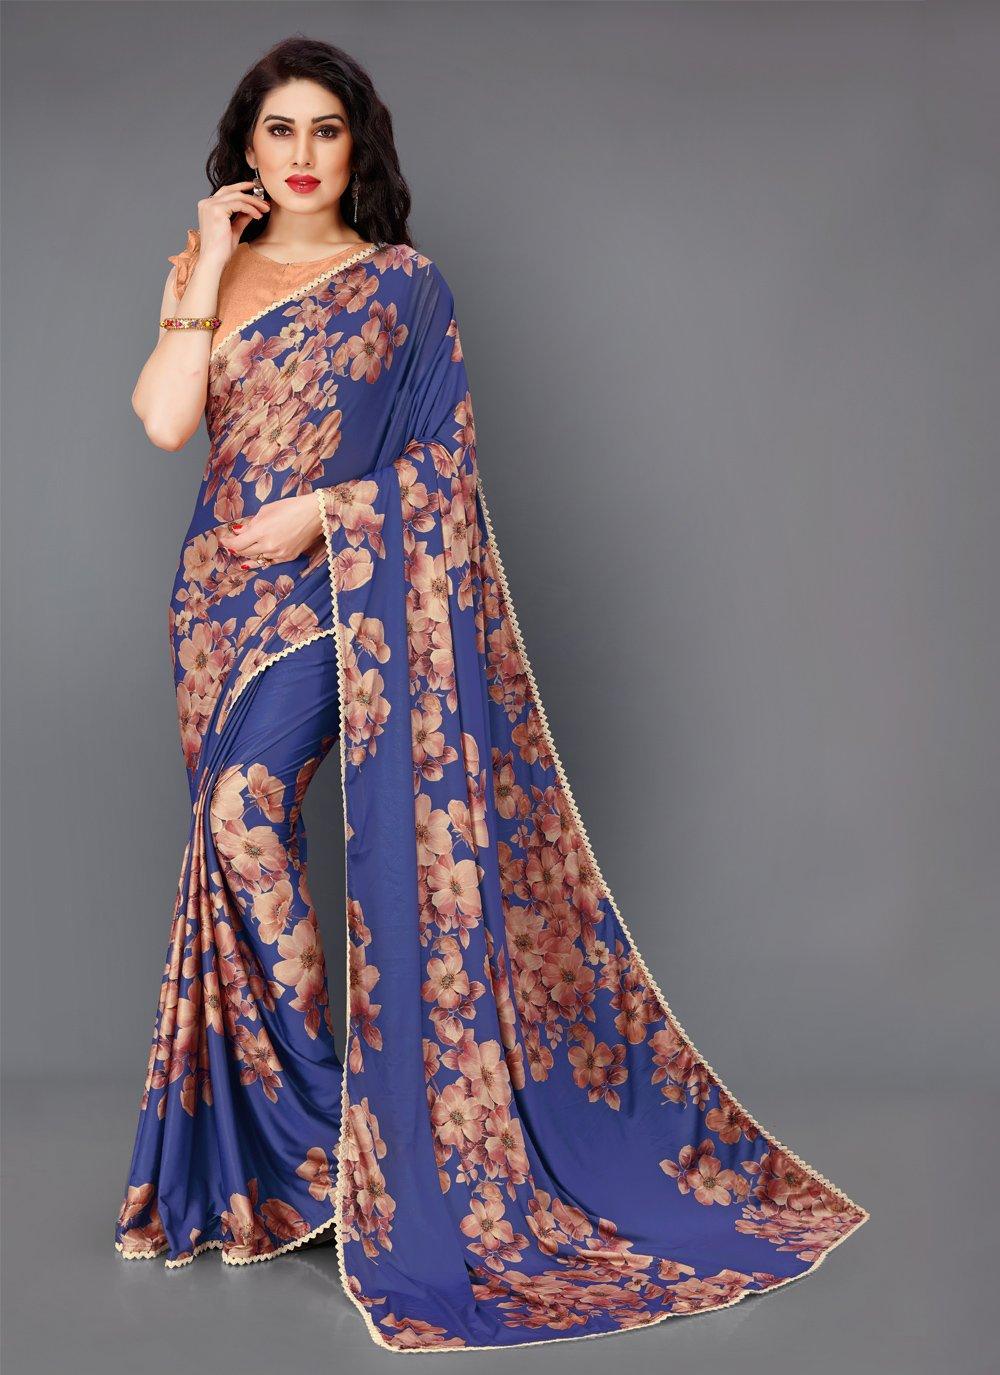 Lycra Floral Print Trendy Saree